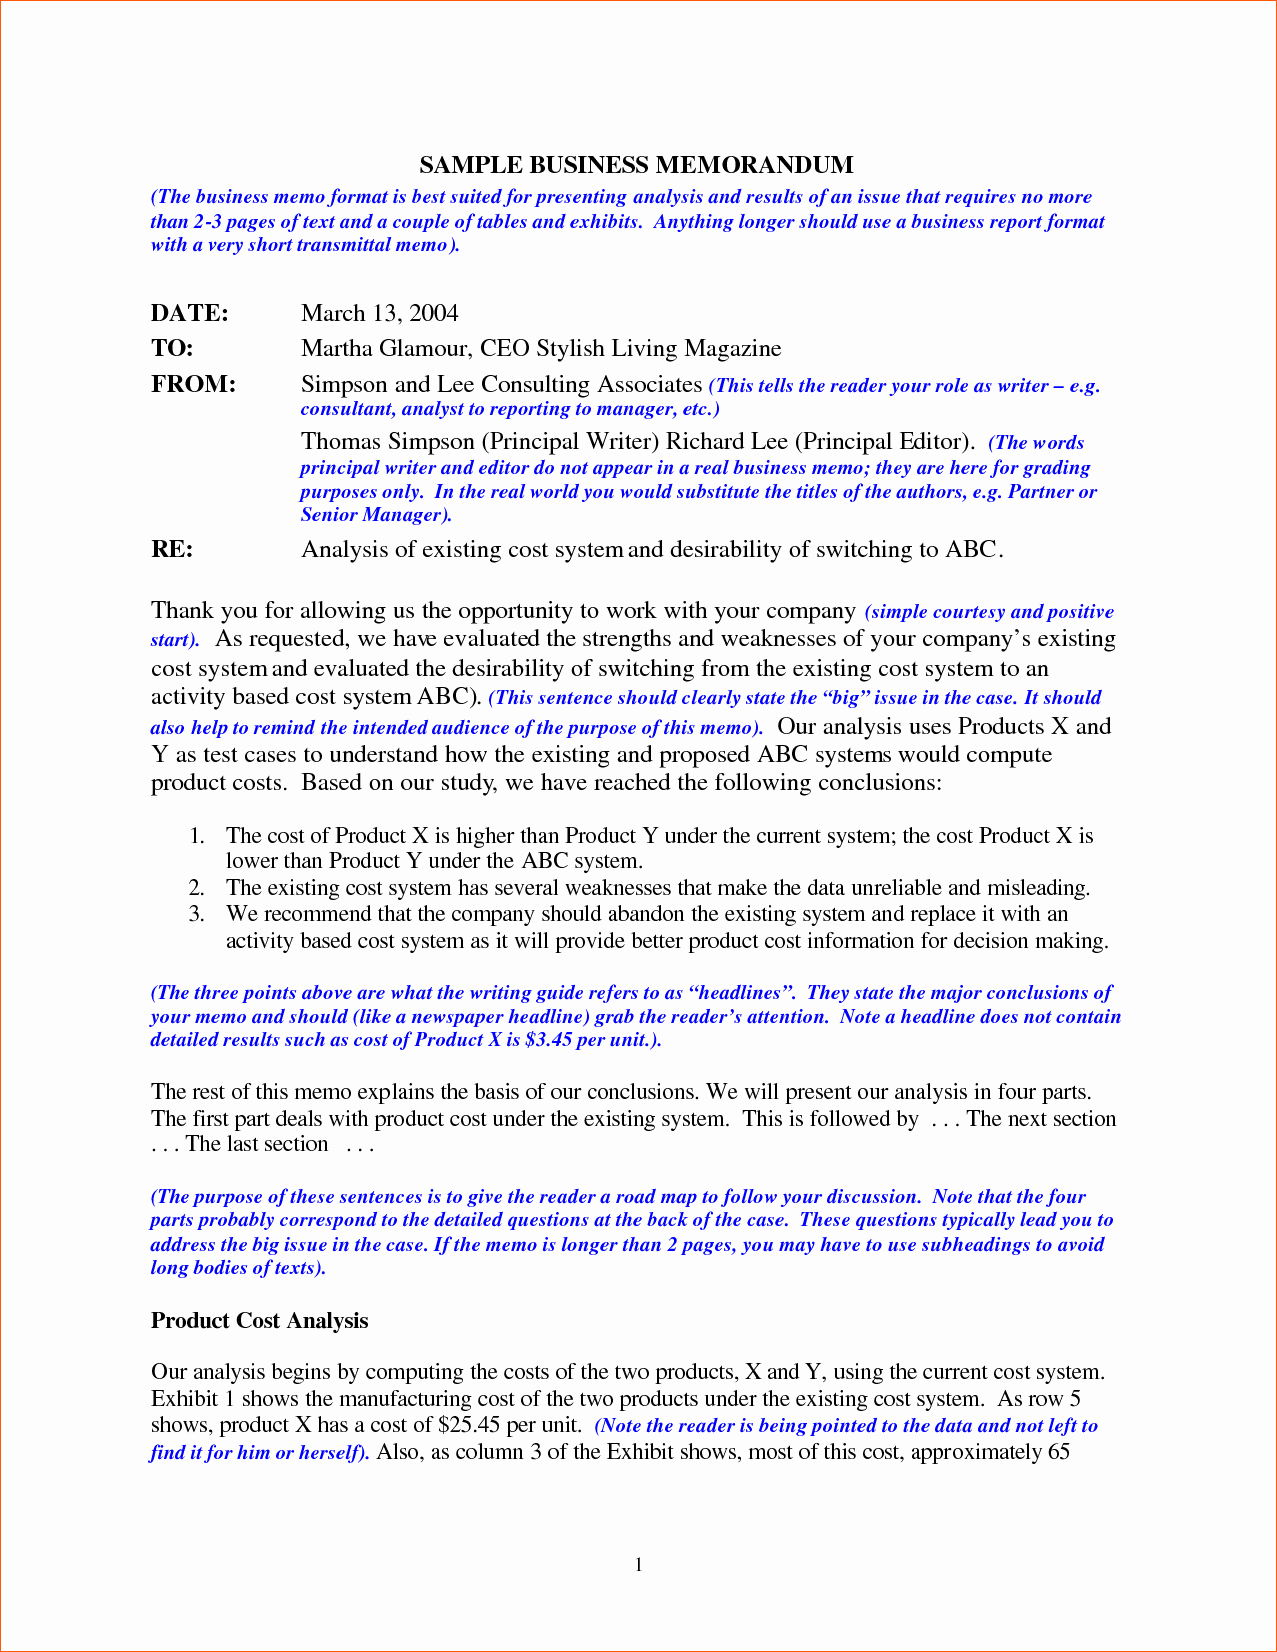 Format Of A Business Memorandum Awesome 6 Business Memo Sample